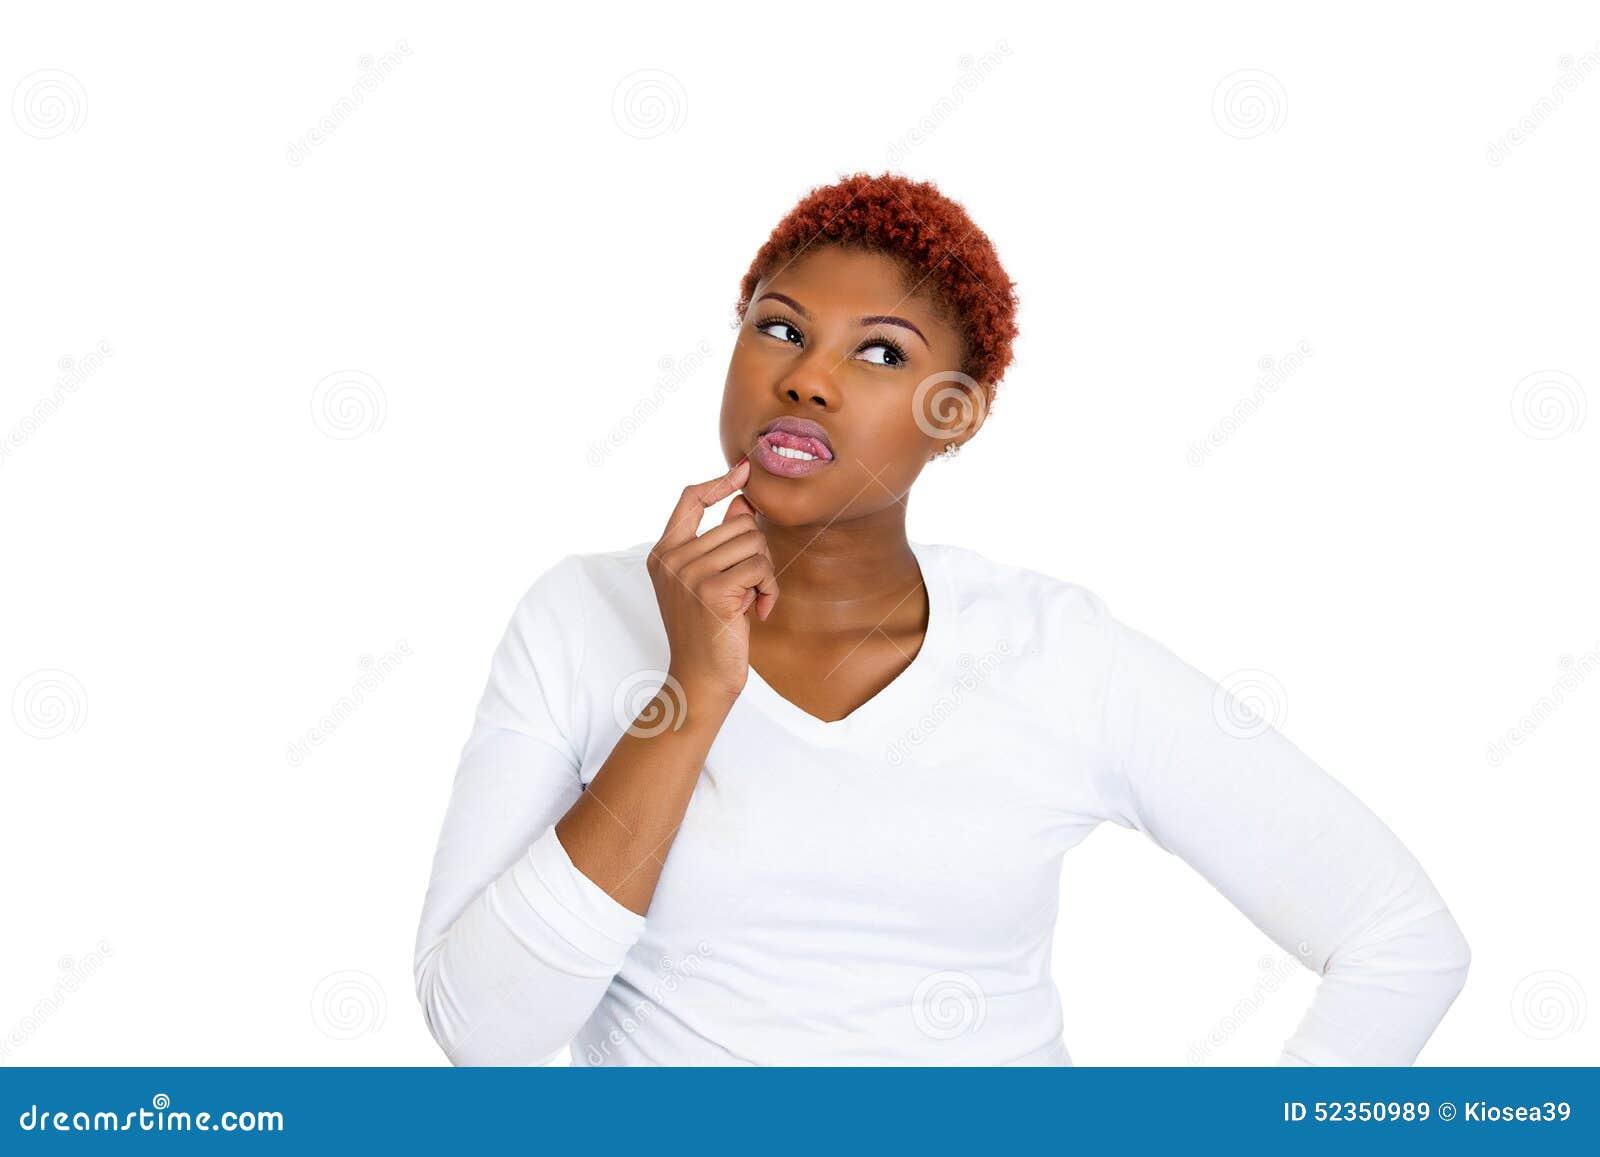 Woman thinking daydreaming something, plotting revenge